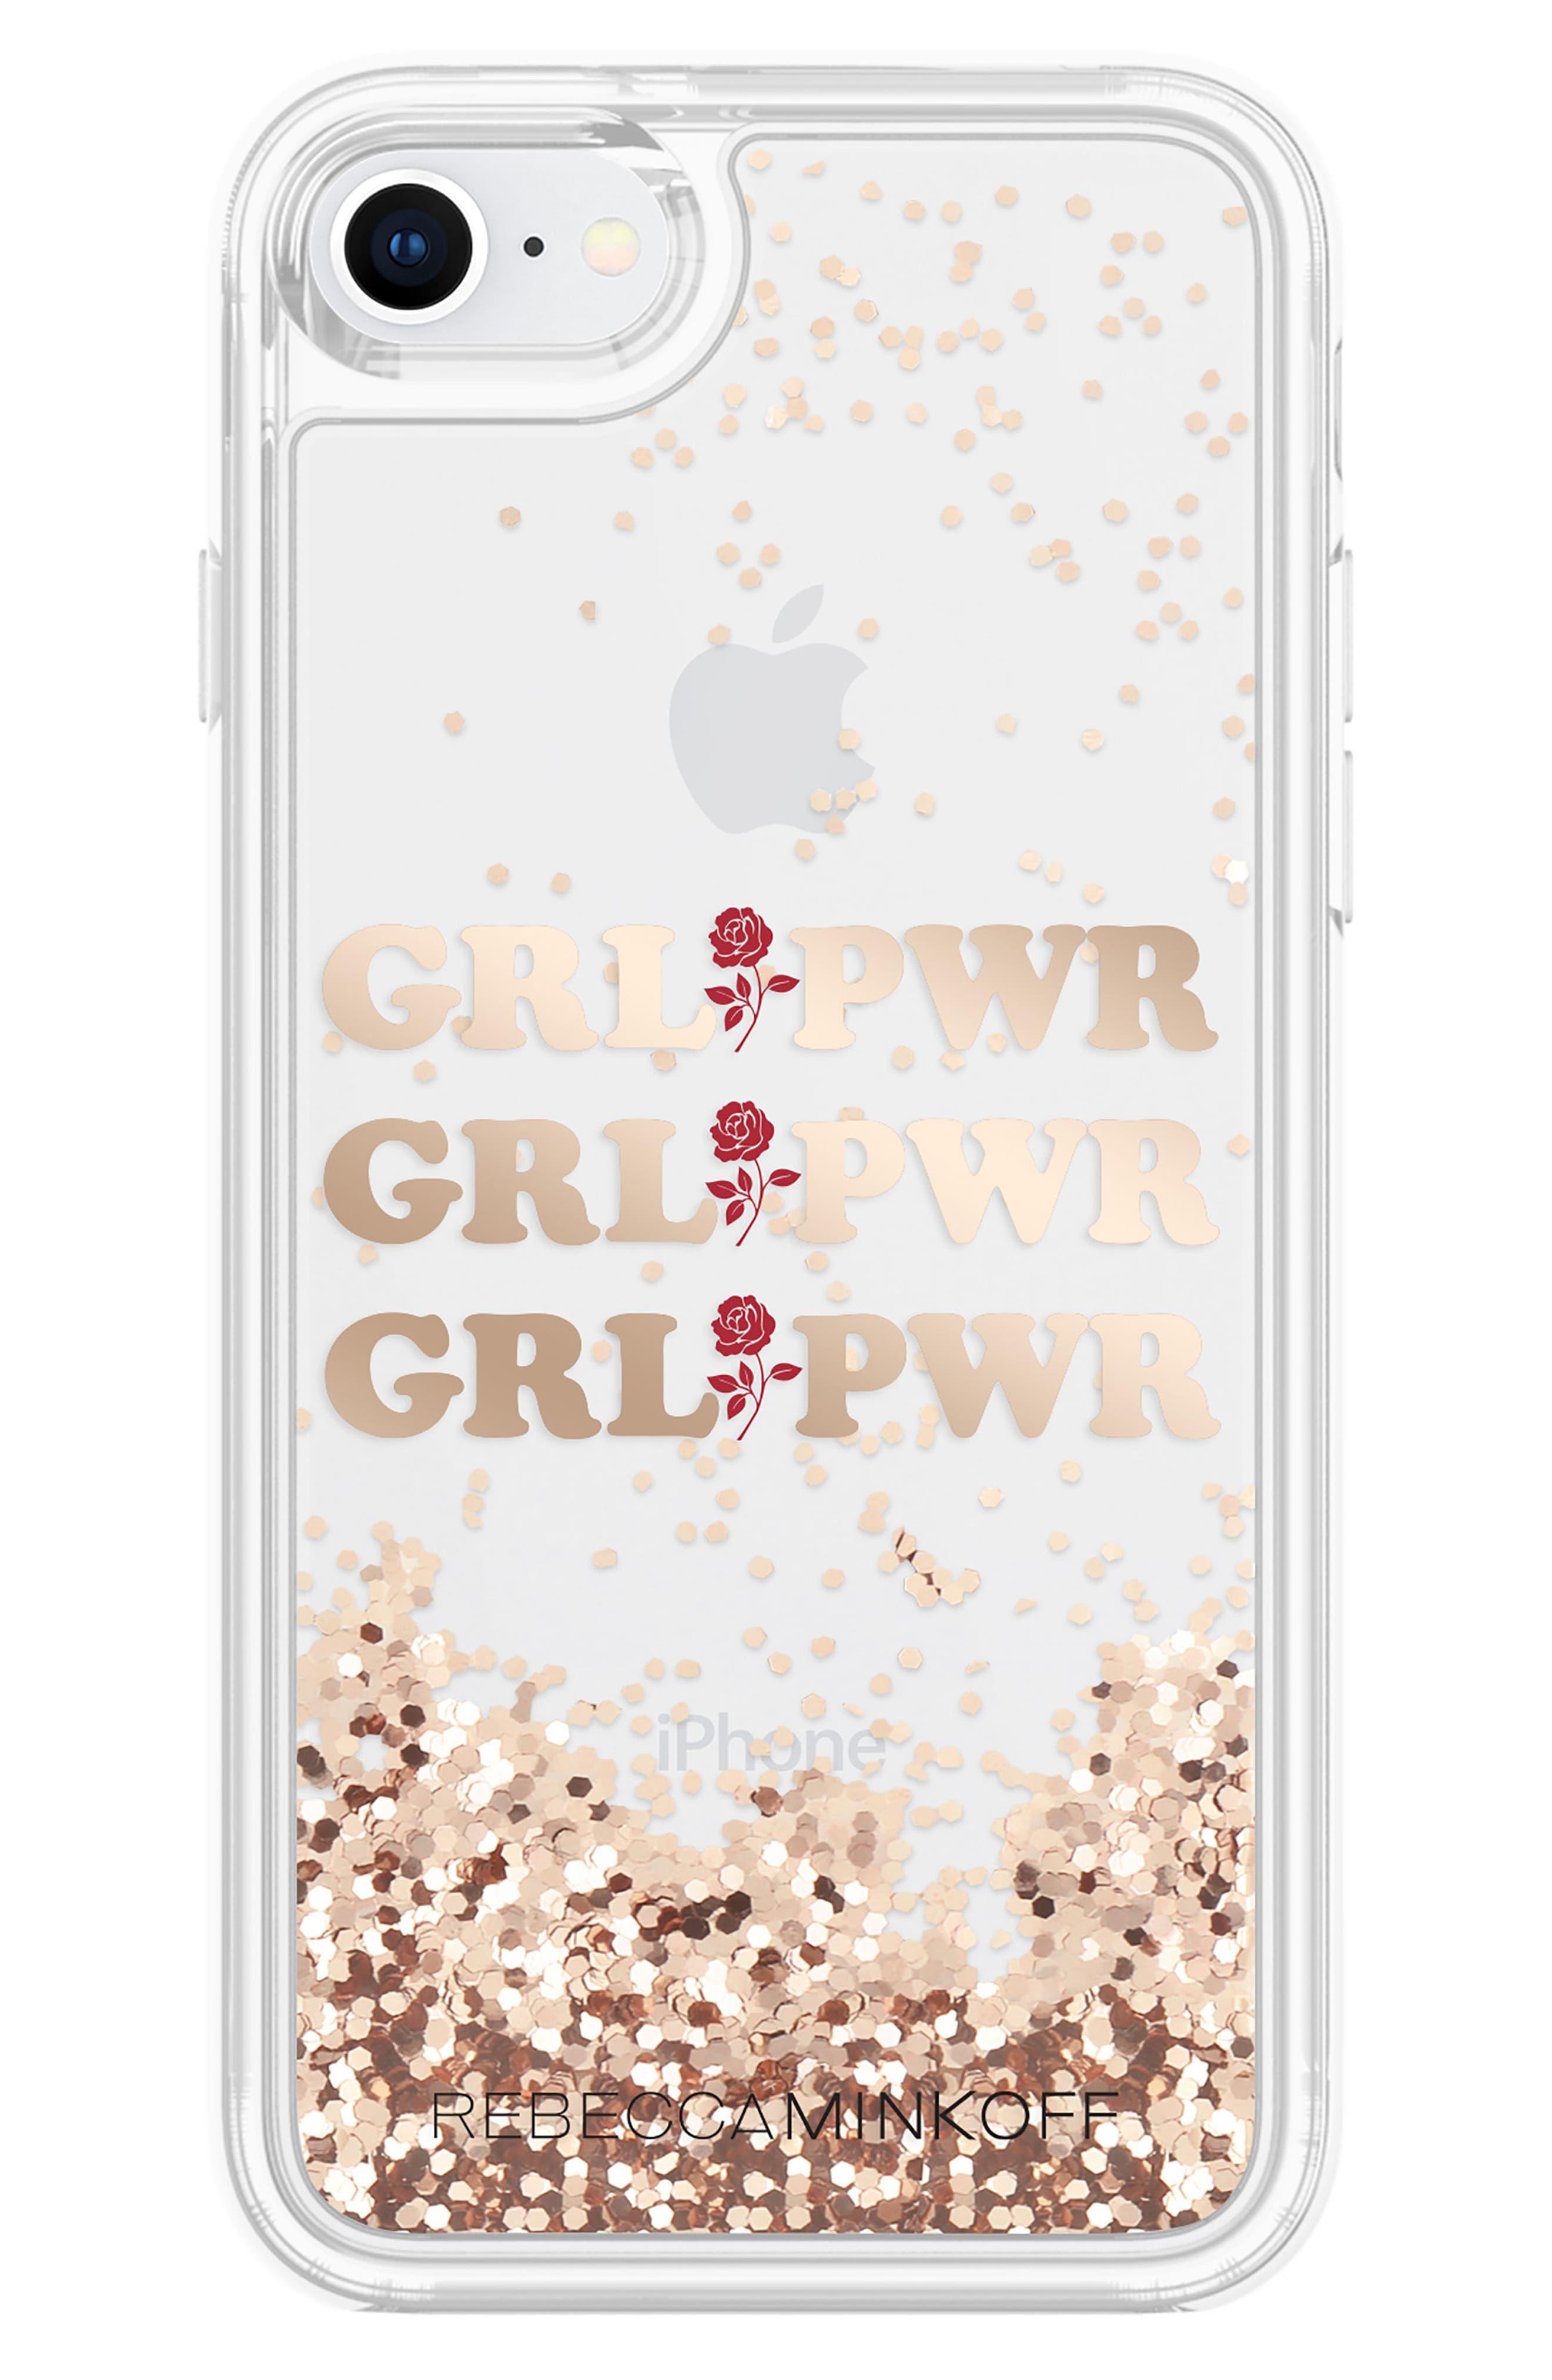 Grl Pwr Glitterfall iPhone 7/8 & 7/8 Plus Case,                             Alternate thumbnail 2, color,                             ROSE GOLD